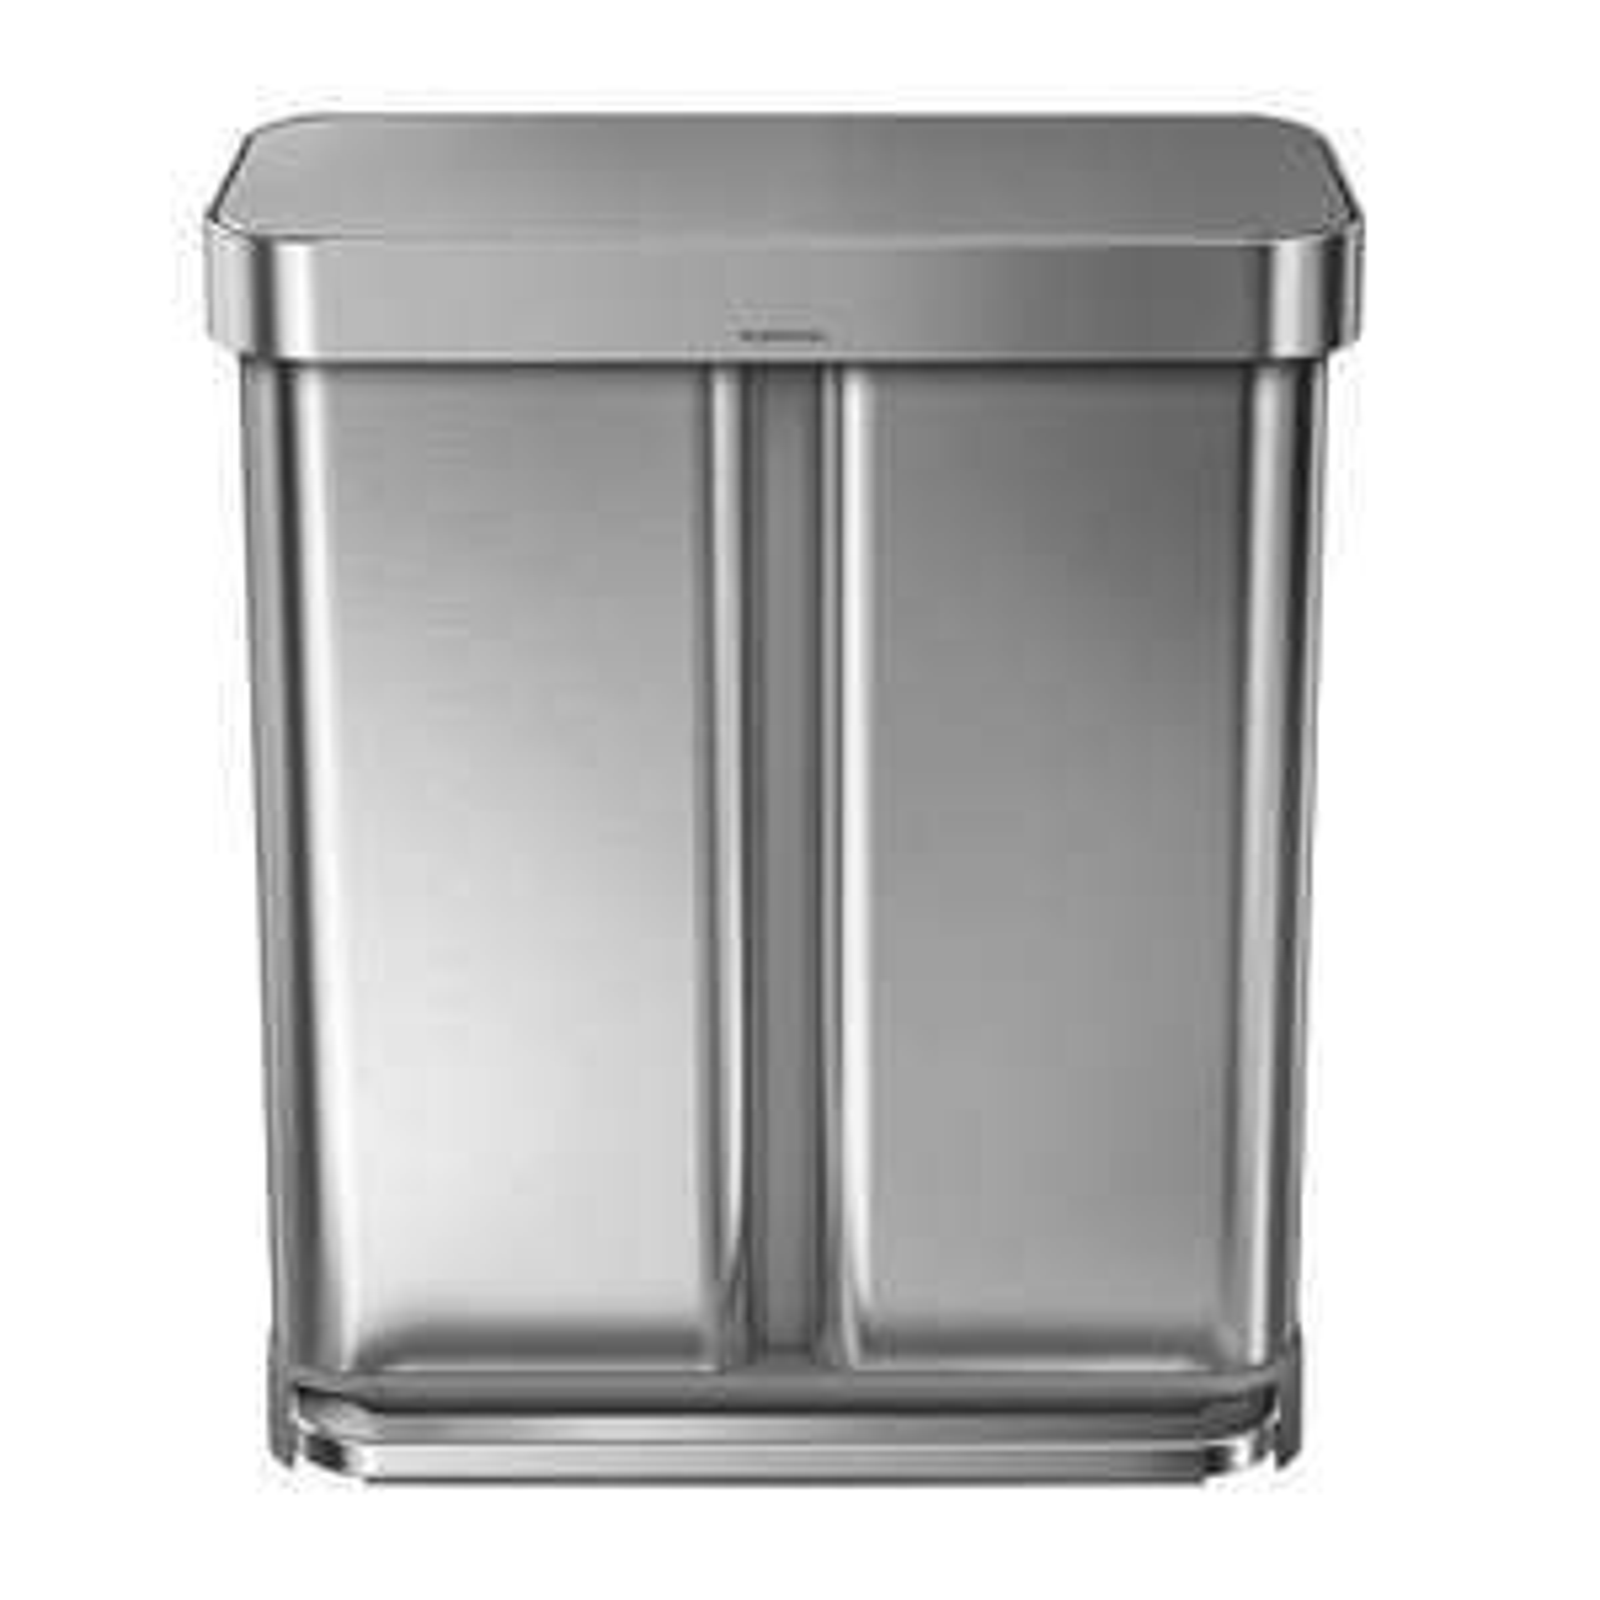 Simplehuman Rectangular Liner Pocket Recycling Bin, 58L, Silver £149 @ Housing Units